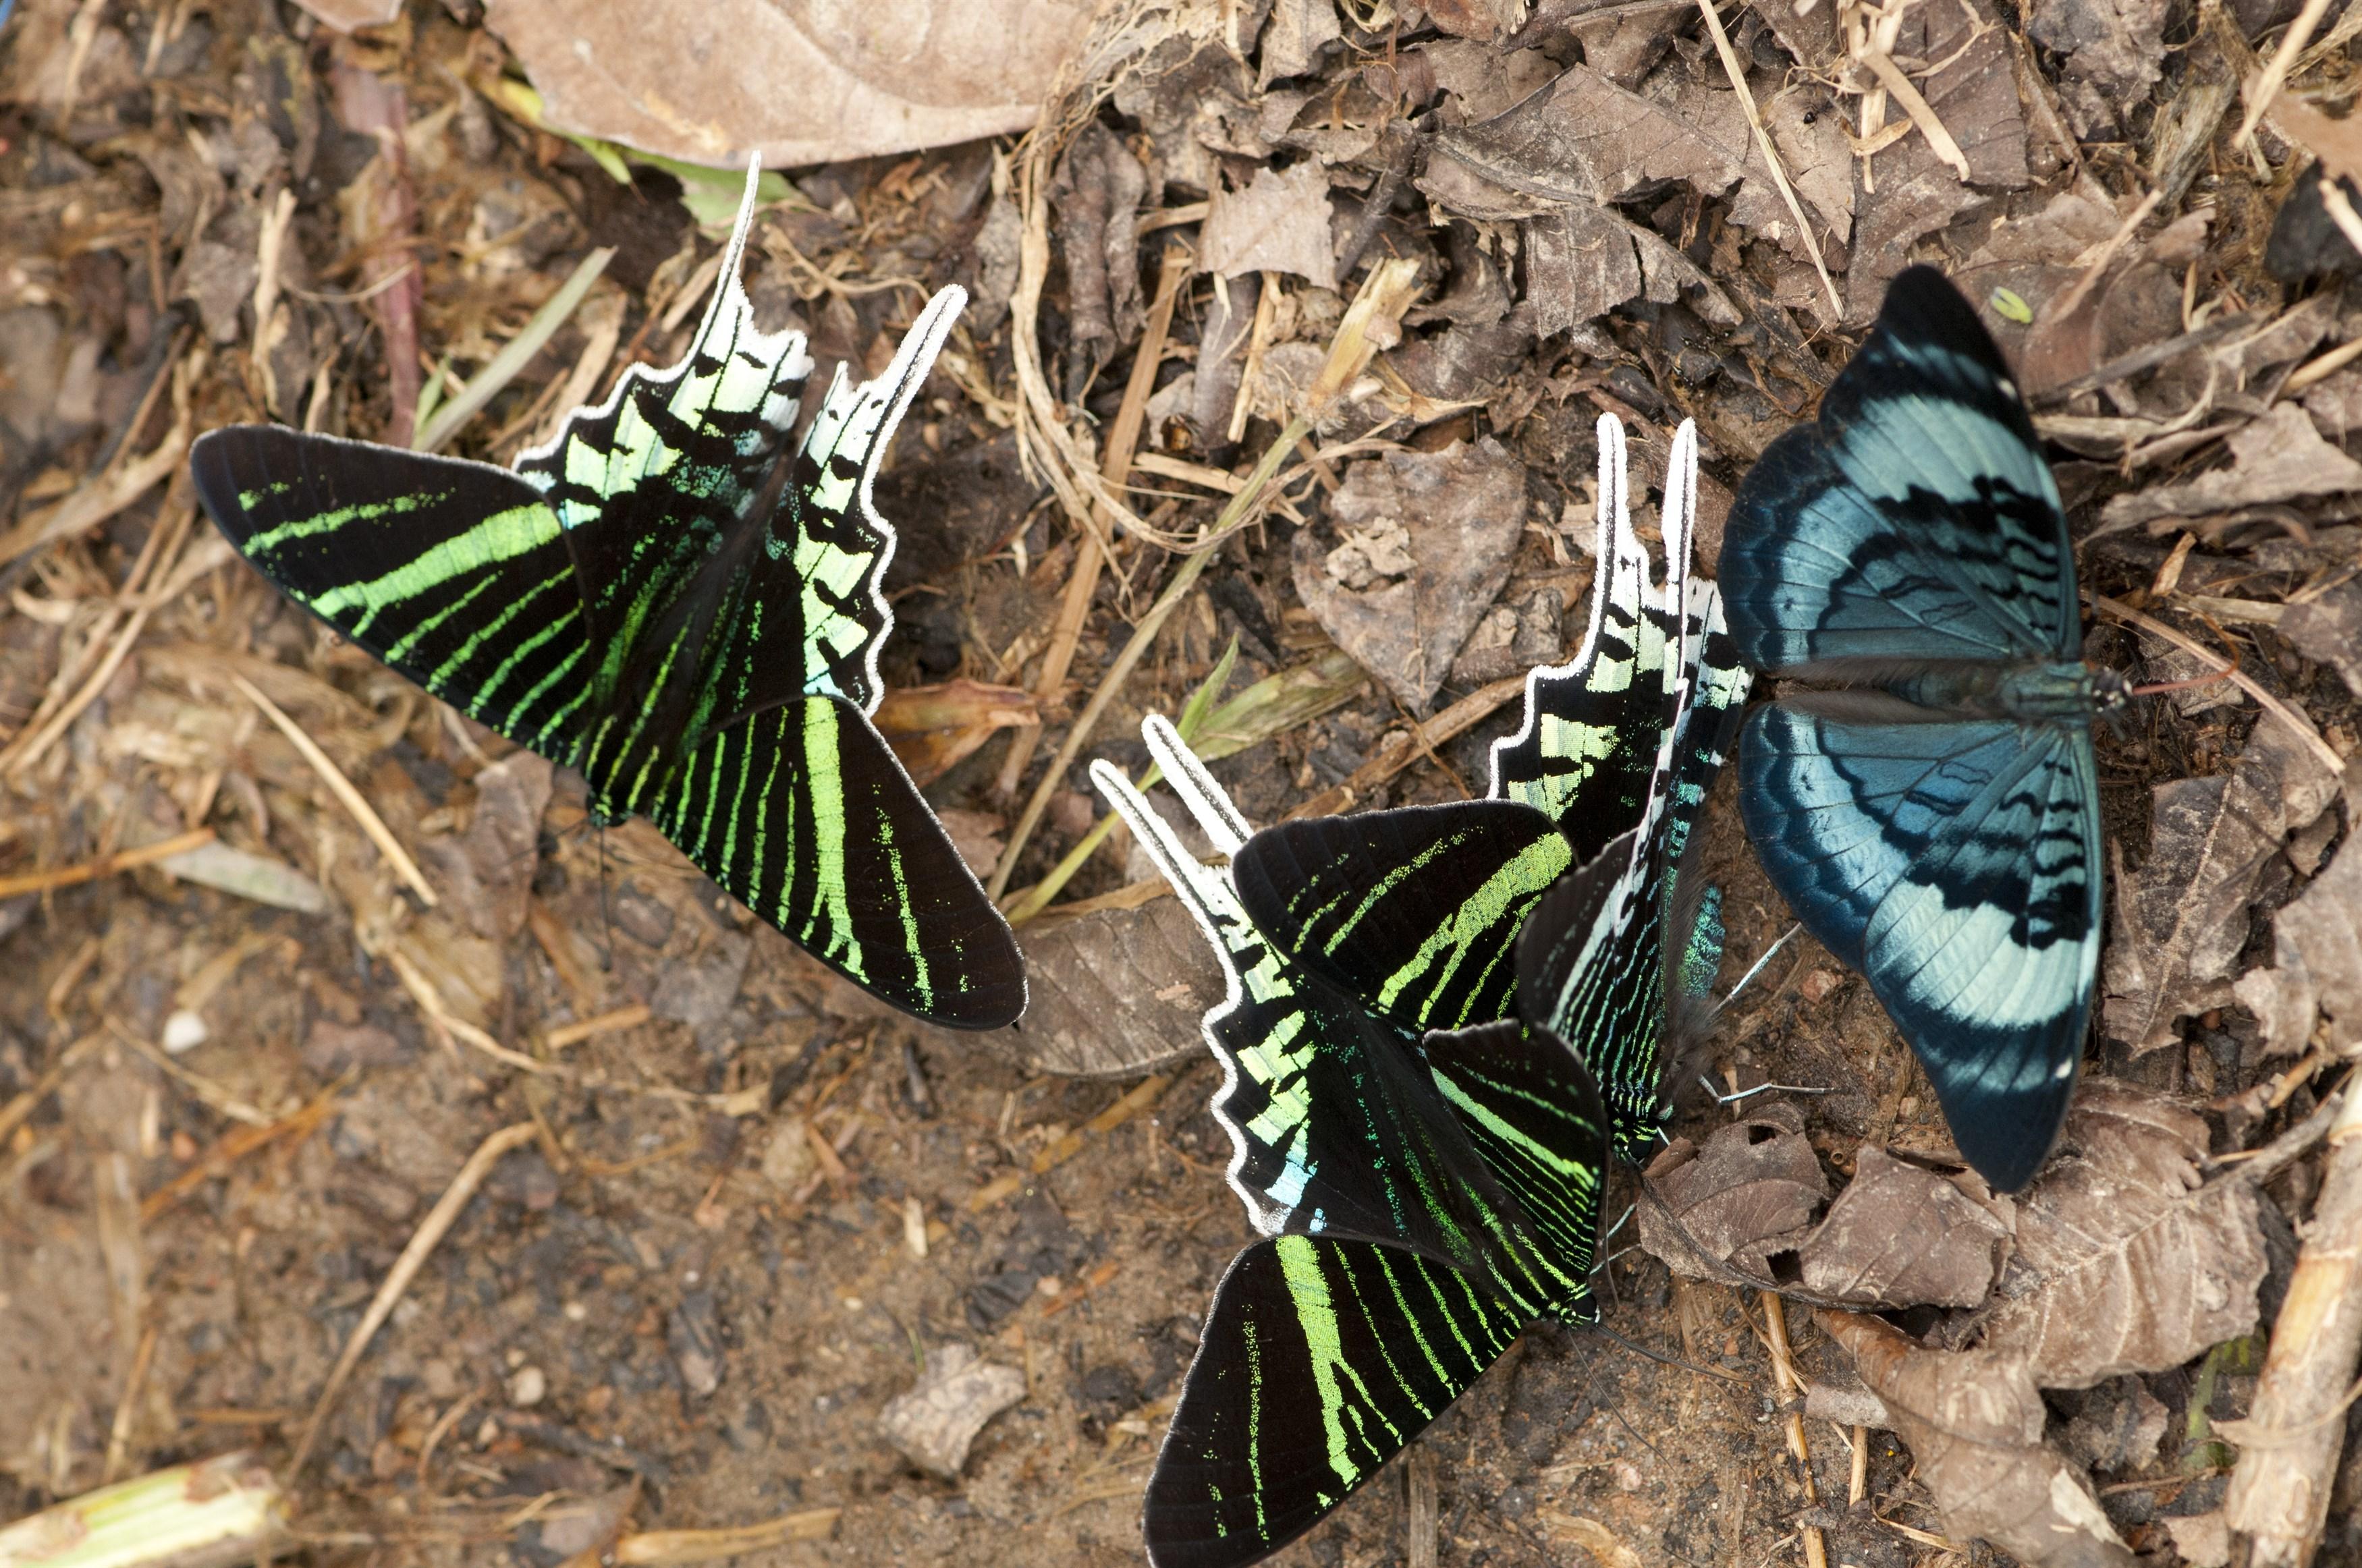 green-banded-urania-urania-leilus-left-panacea-regina-right-yasuni-national-park-ecuador_00b1-3500x2324px